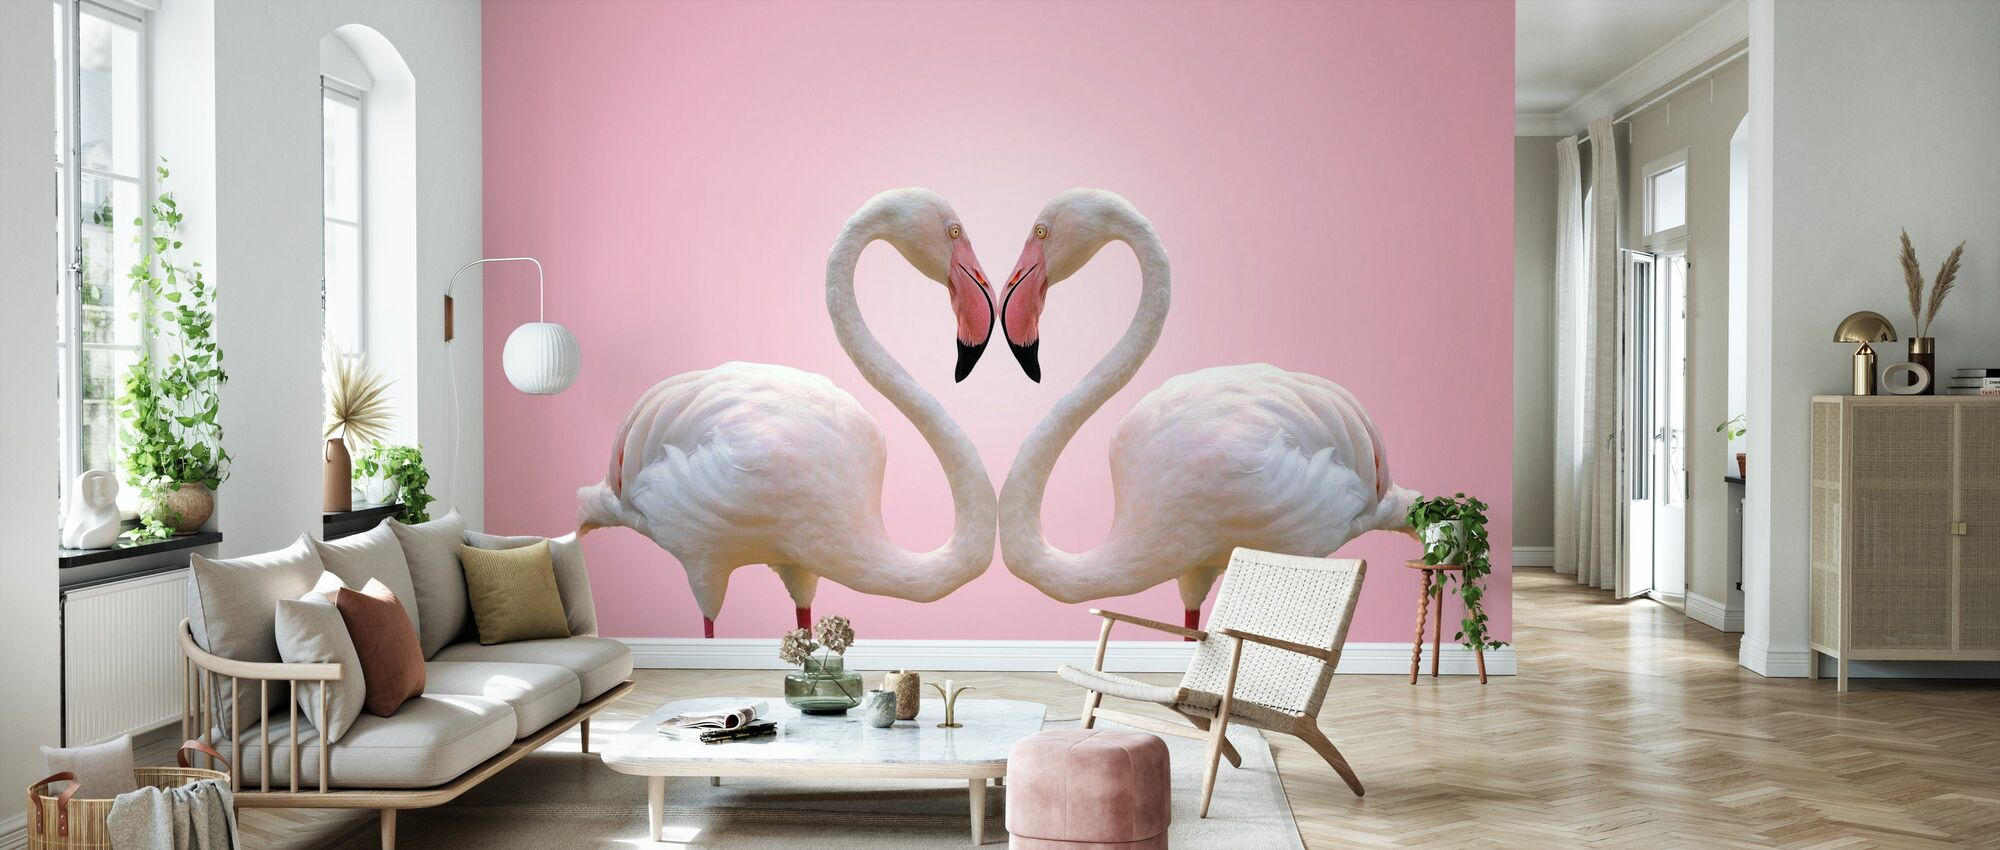 Couple Flamingo - Wallpaper - Living Room